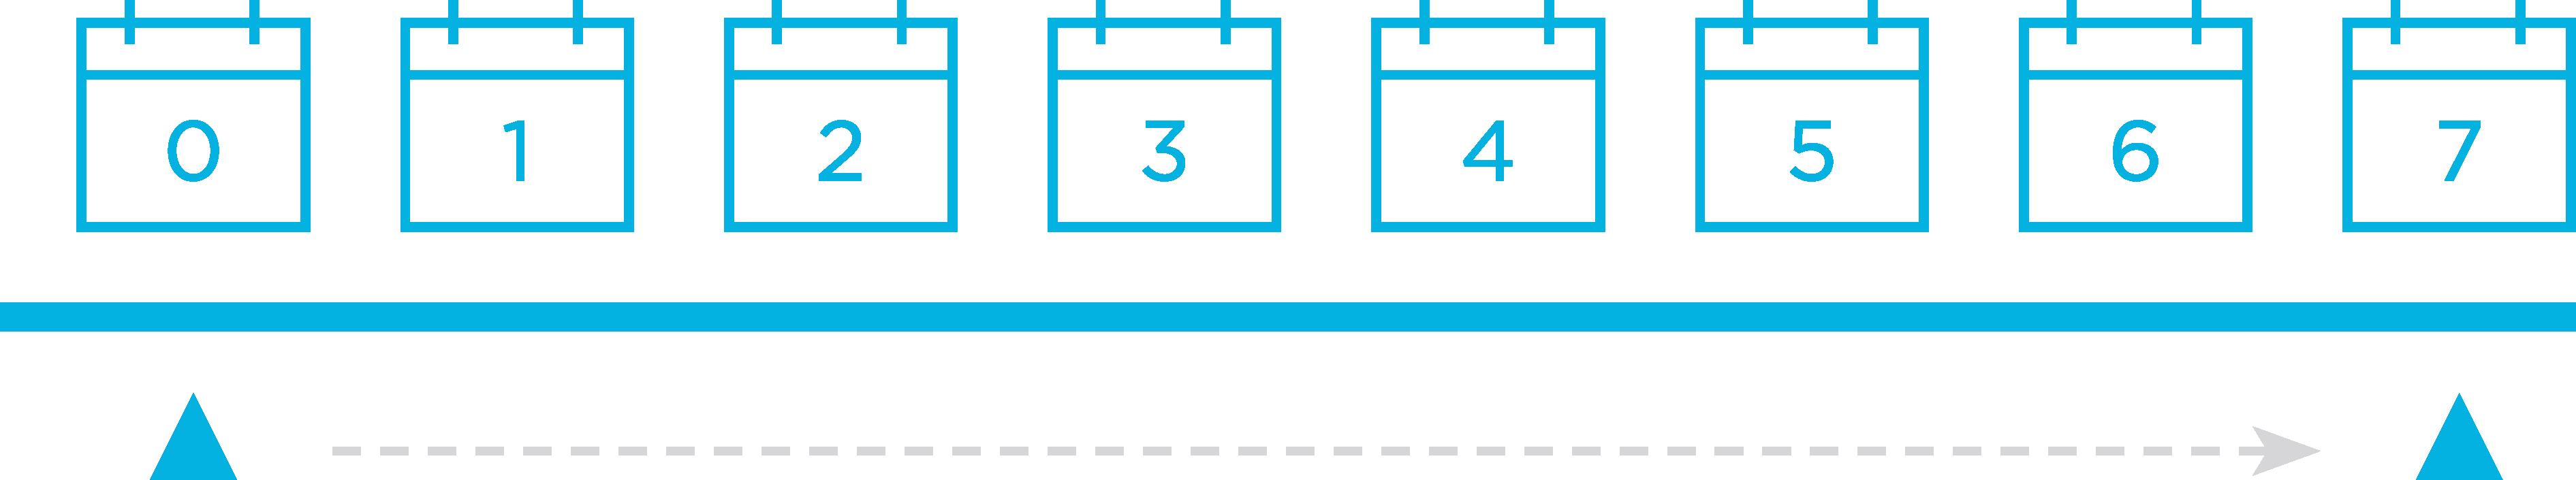 SKAdNetwork Conversion Model Window